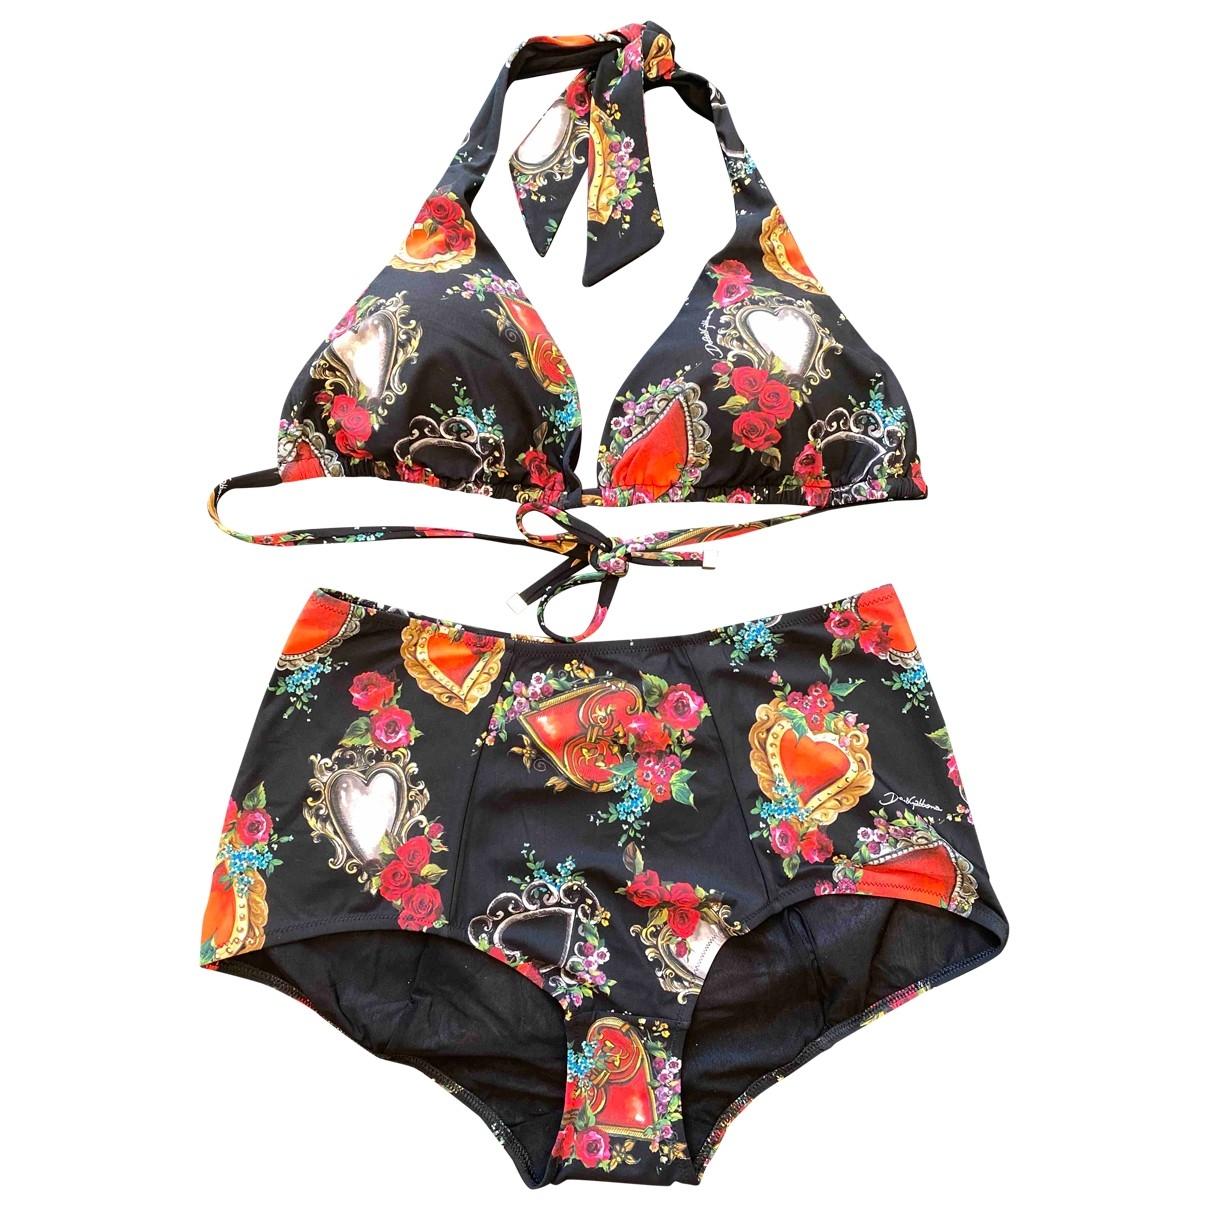 Dolce & Gabbana \N Badeanzug in  Schwarz Synthetik